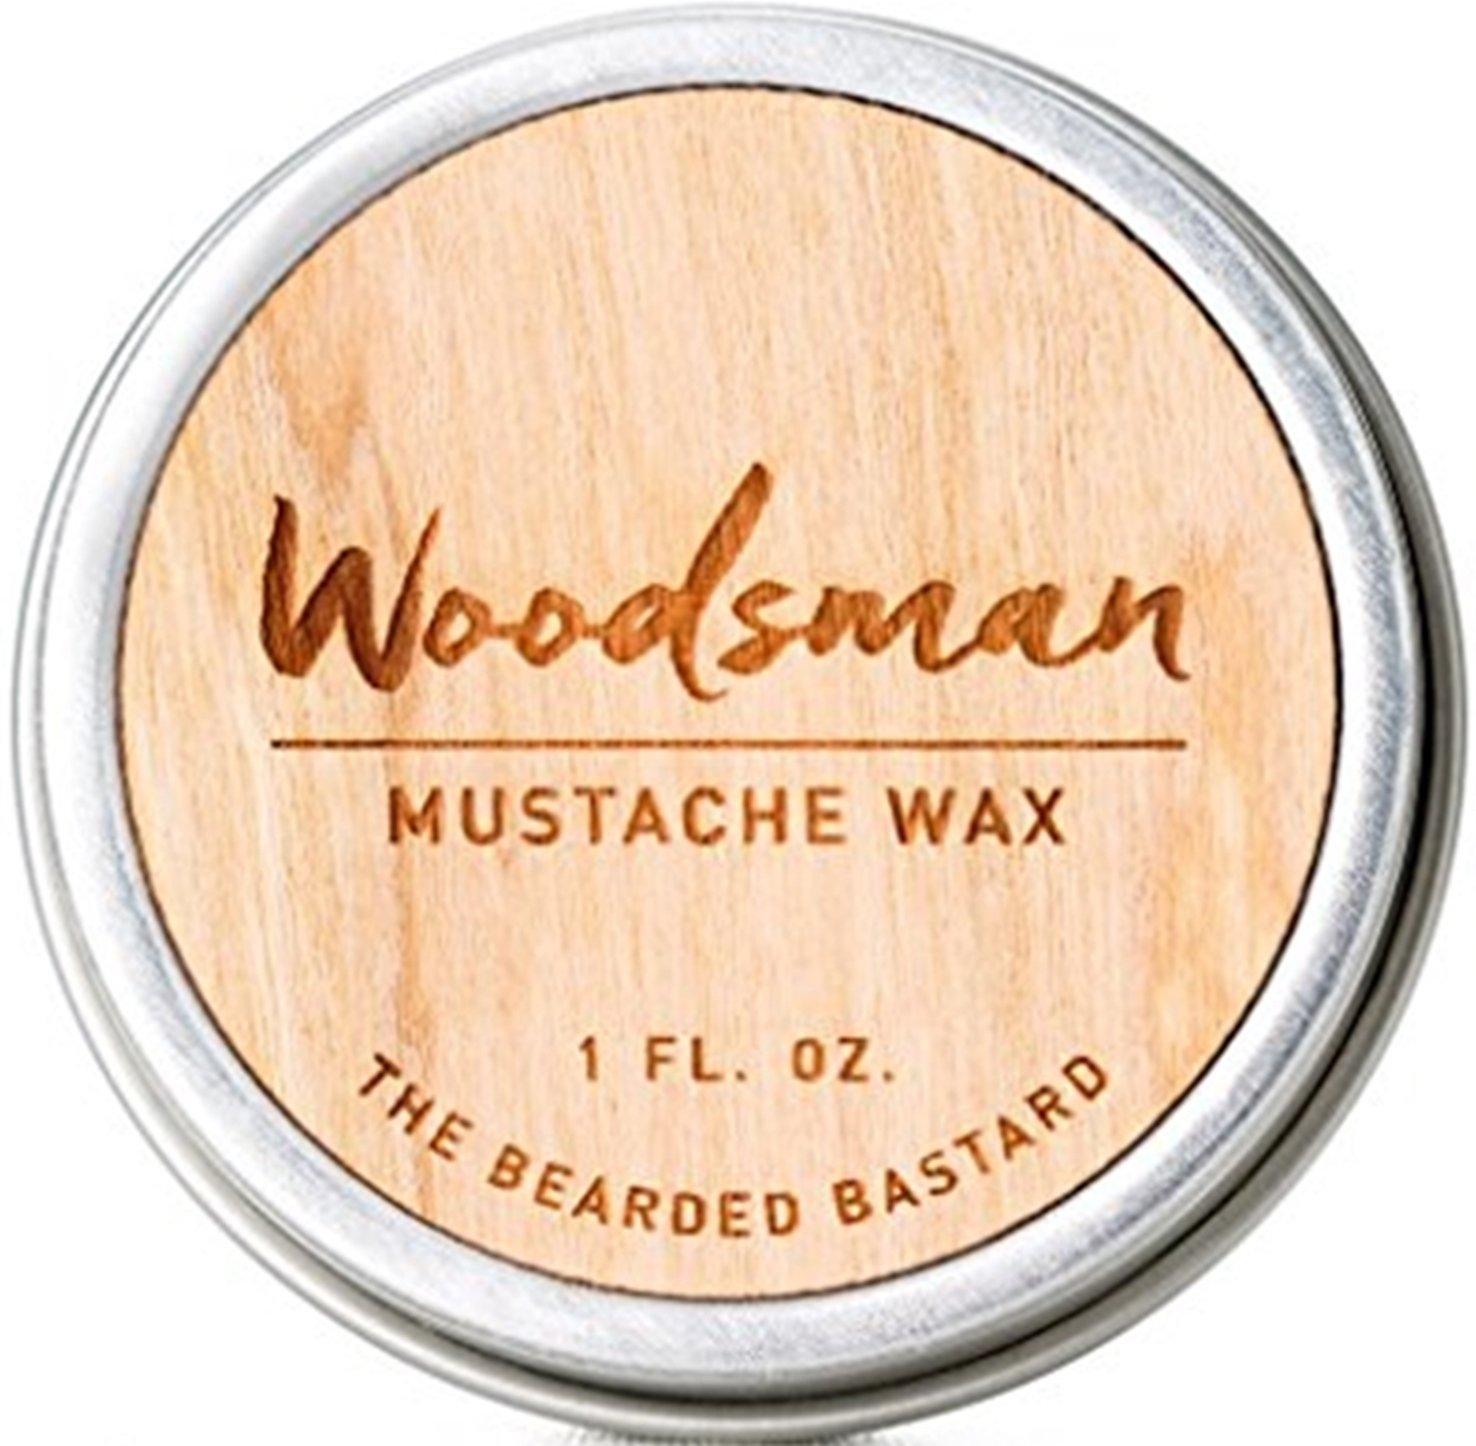 Woodsman Mustache Wax by The Bearded Bastard — Natural Mustache Wax (1 oz)